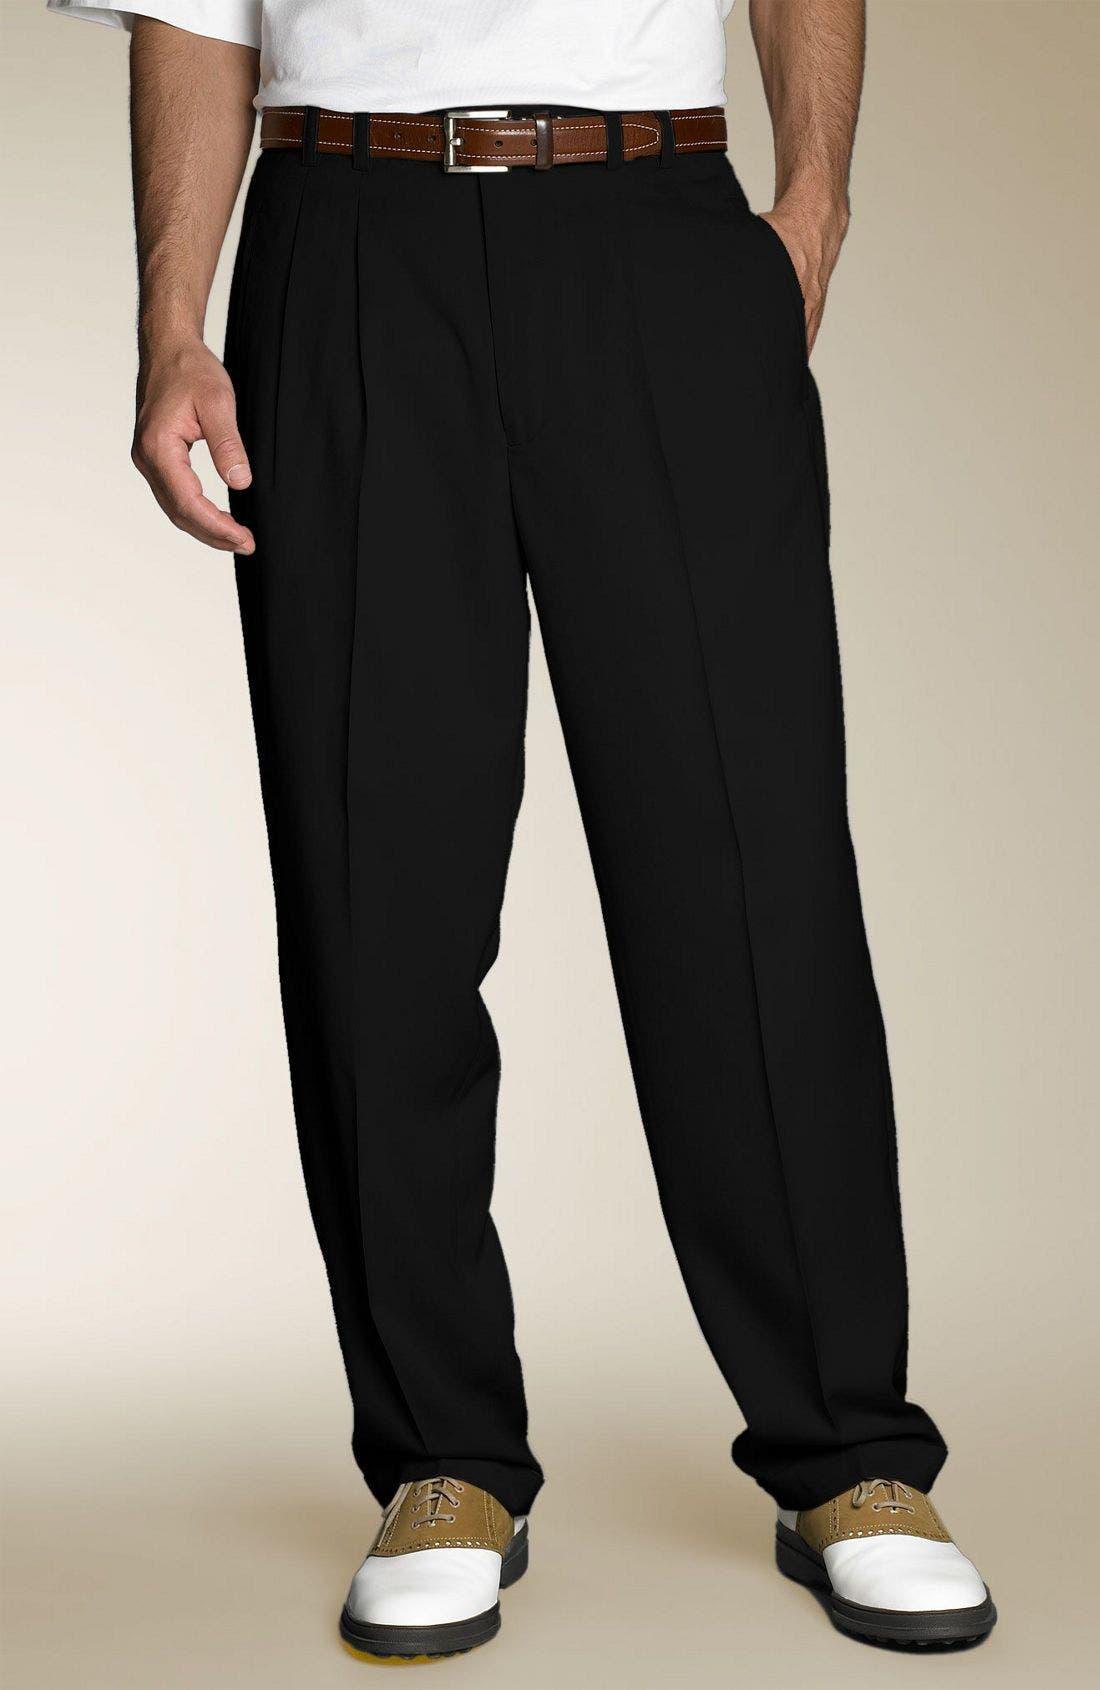 Main Image - Cutter & Buck Gabardine Microfiber Cuff Golf Trousers